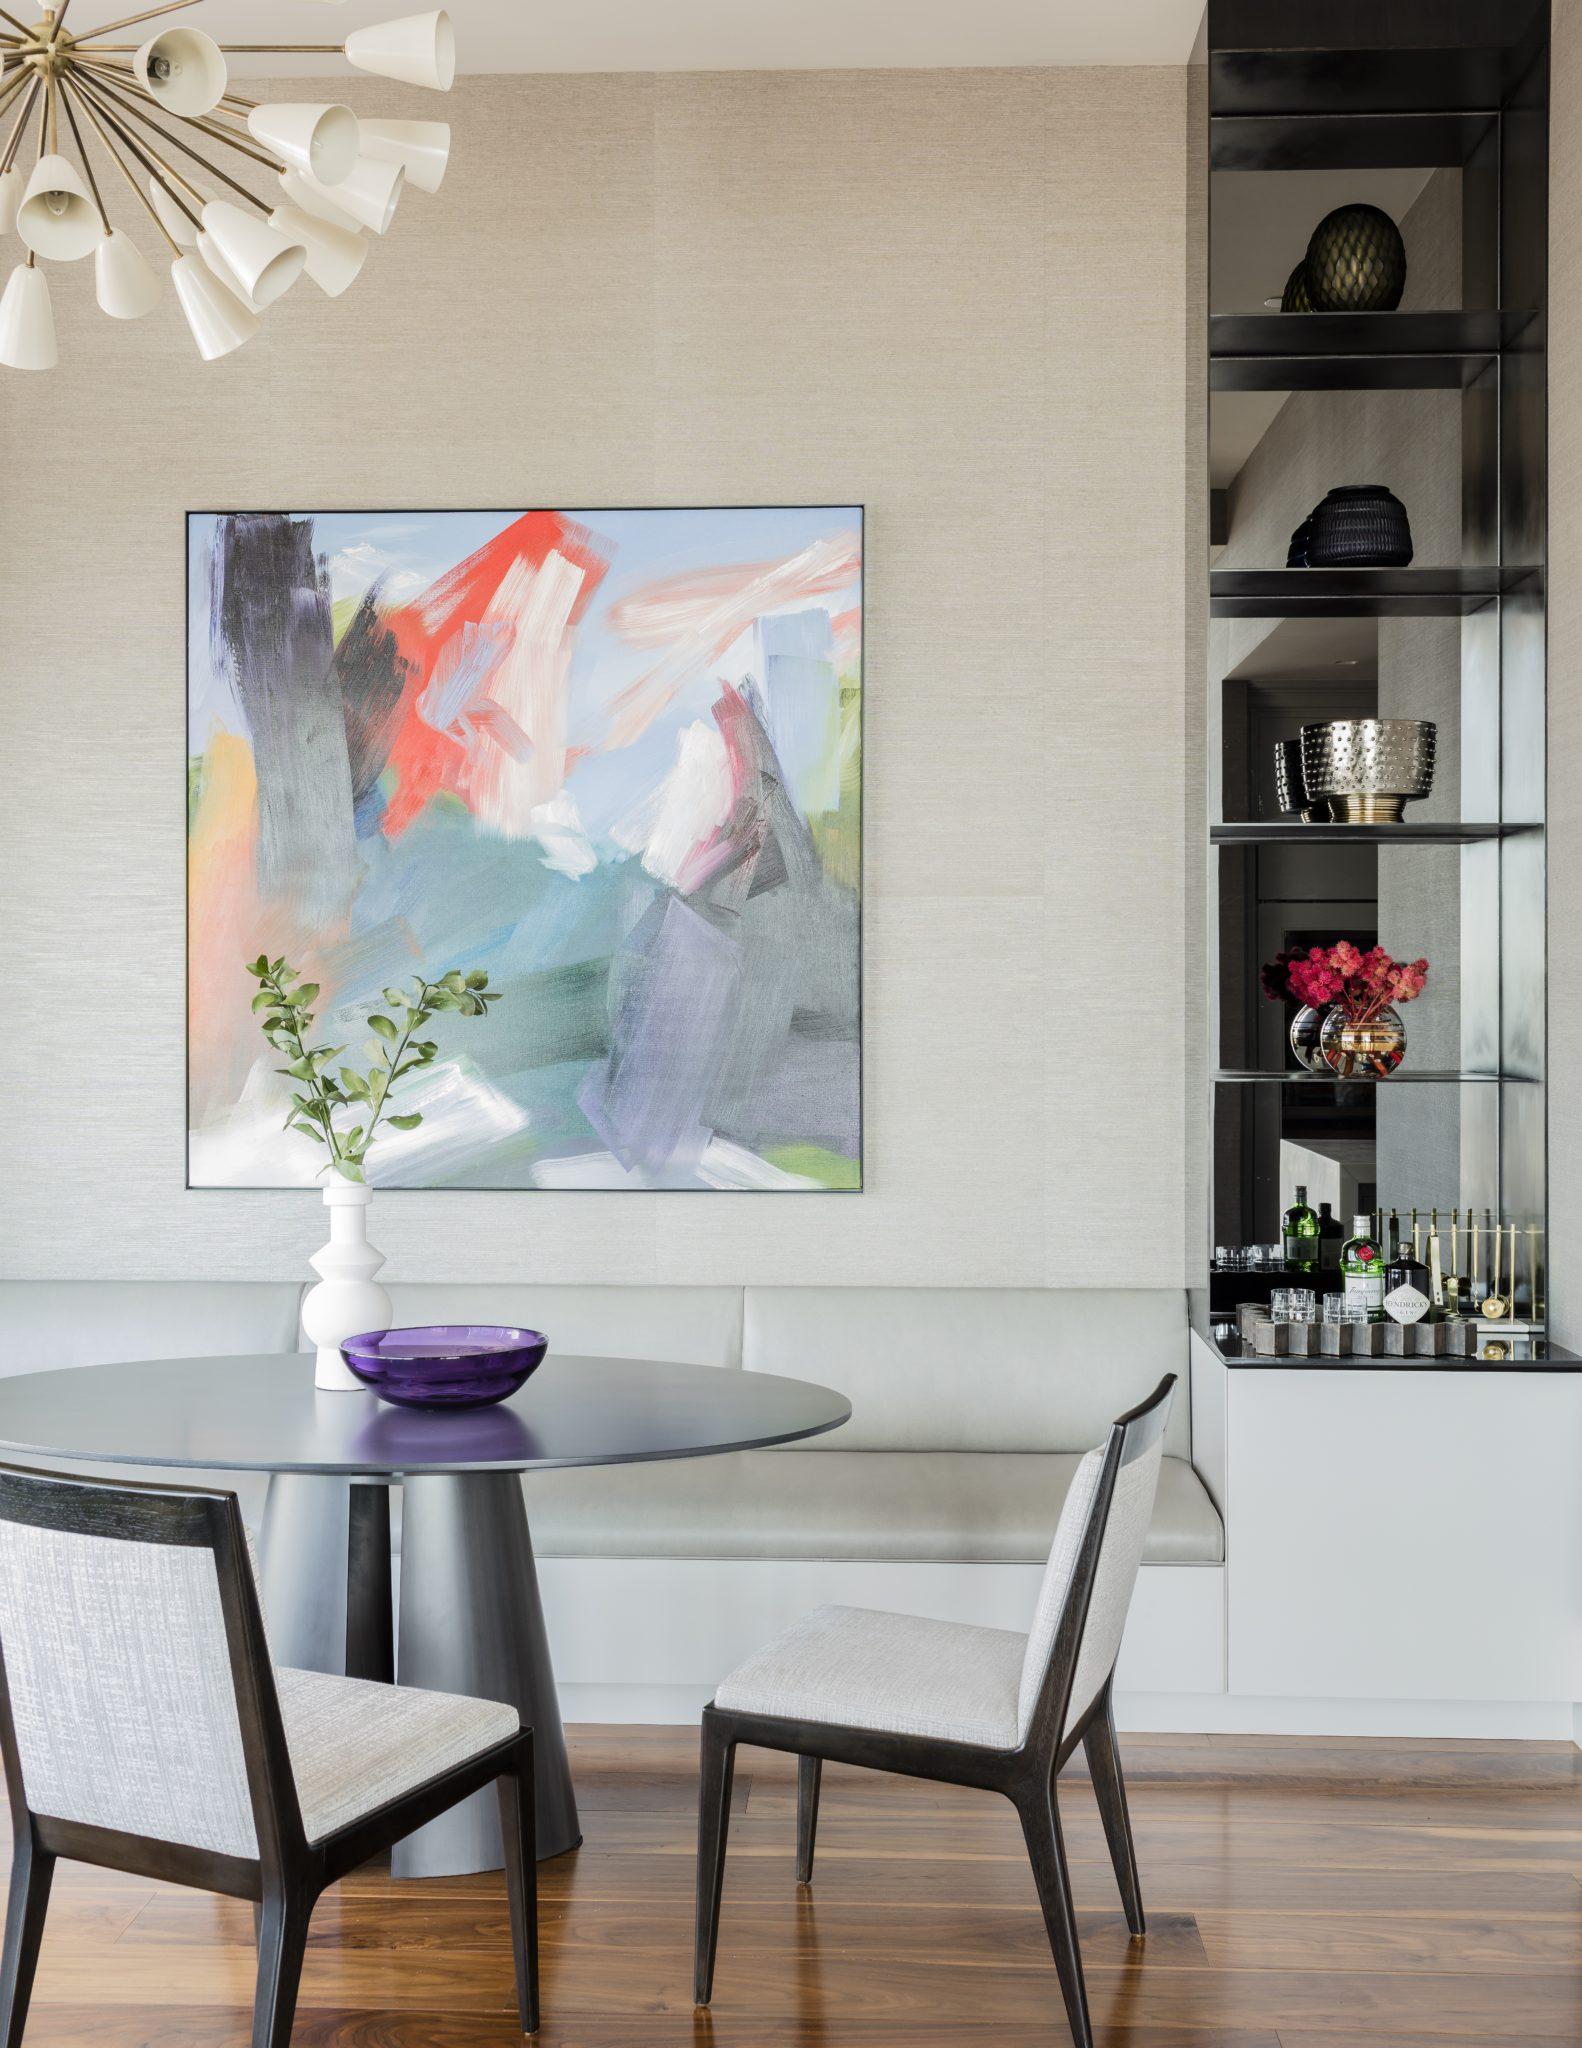 Millennium Tower Boston - dining room by Elms Interior Design